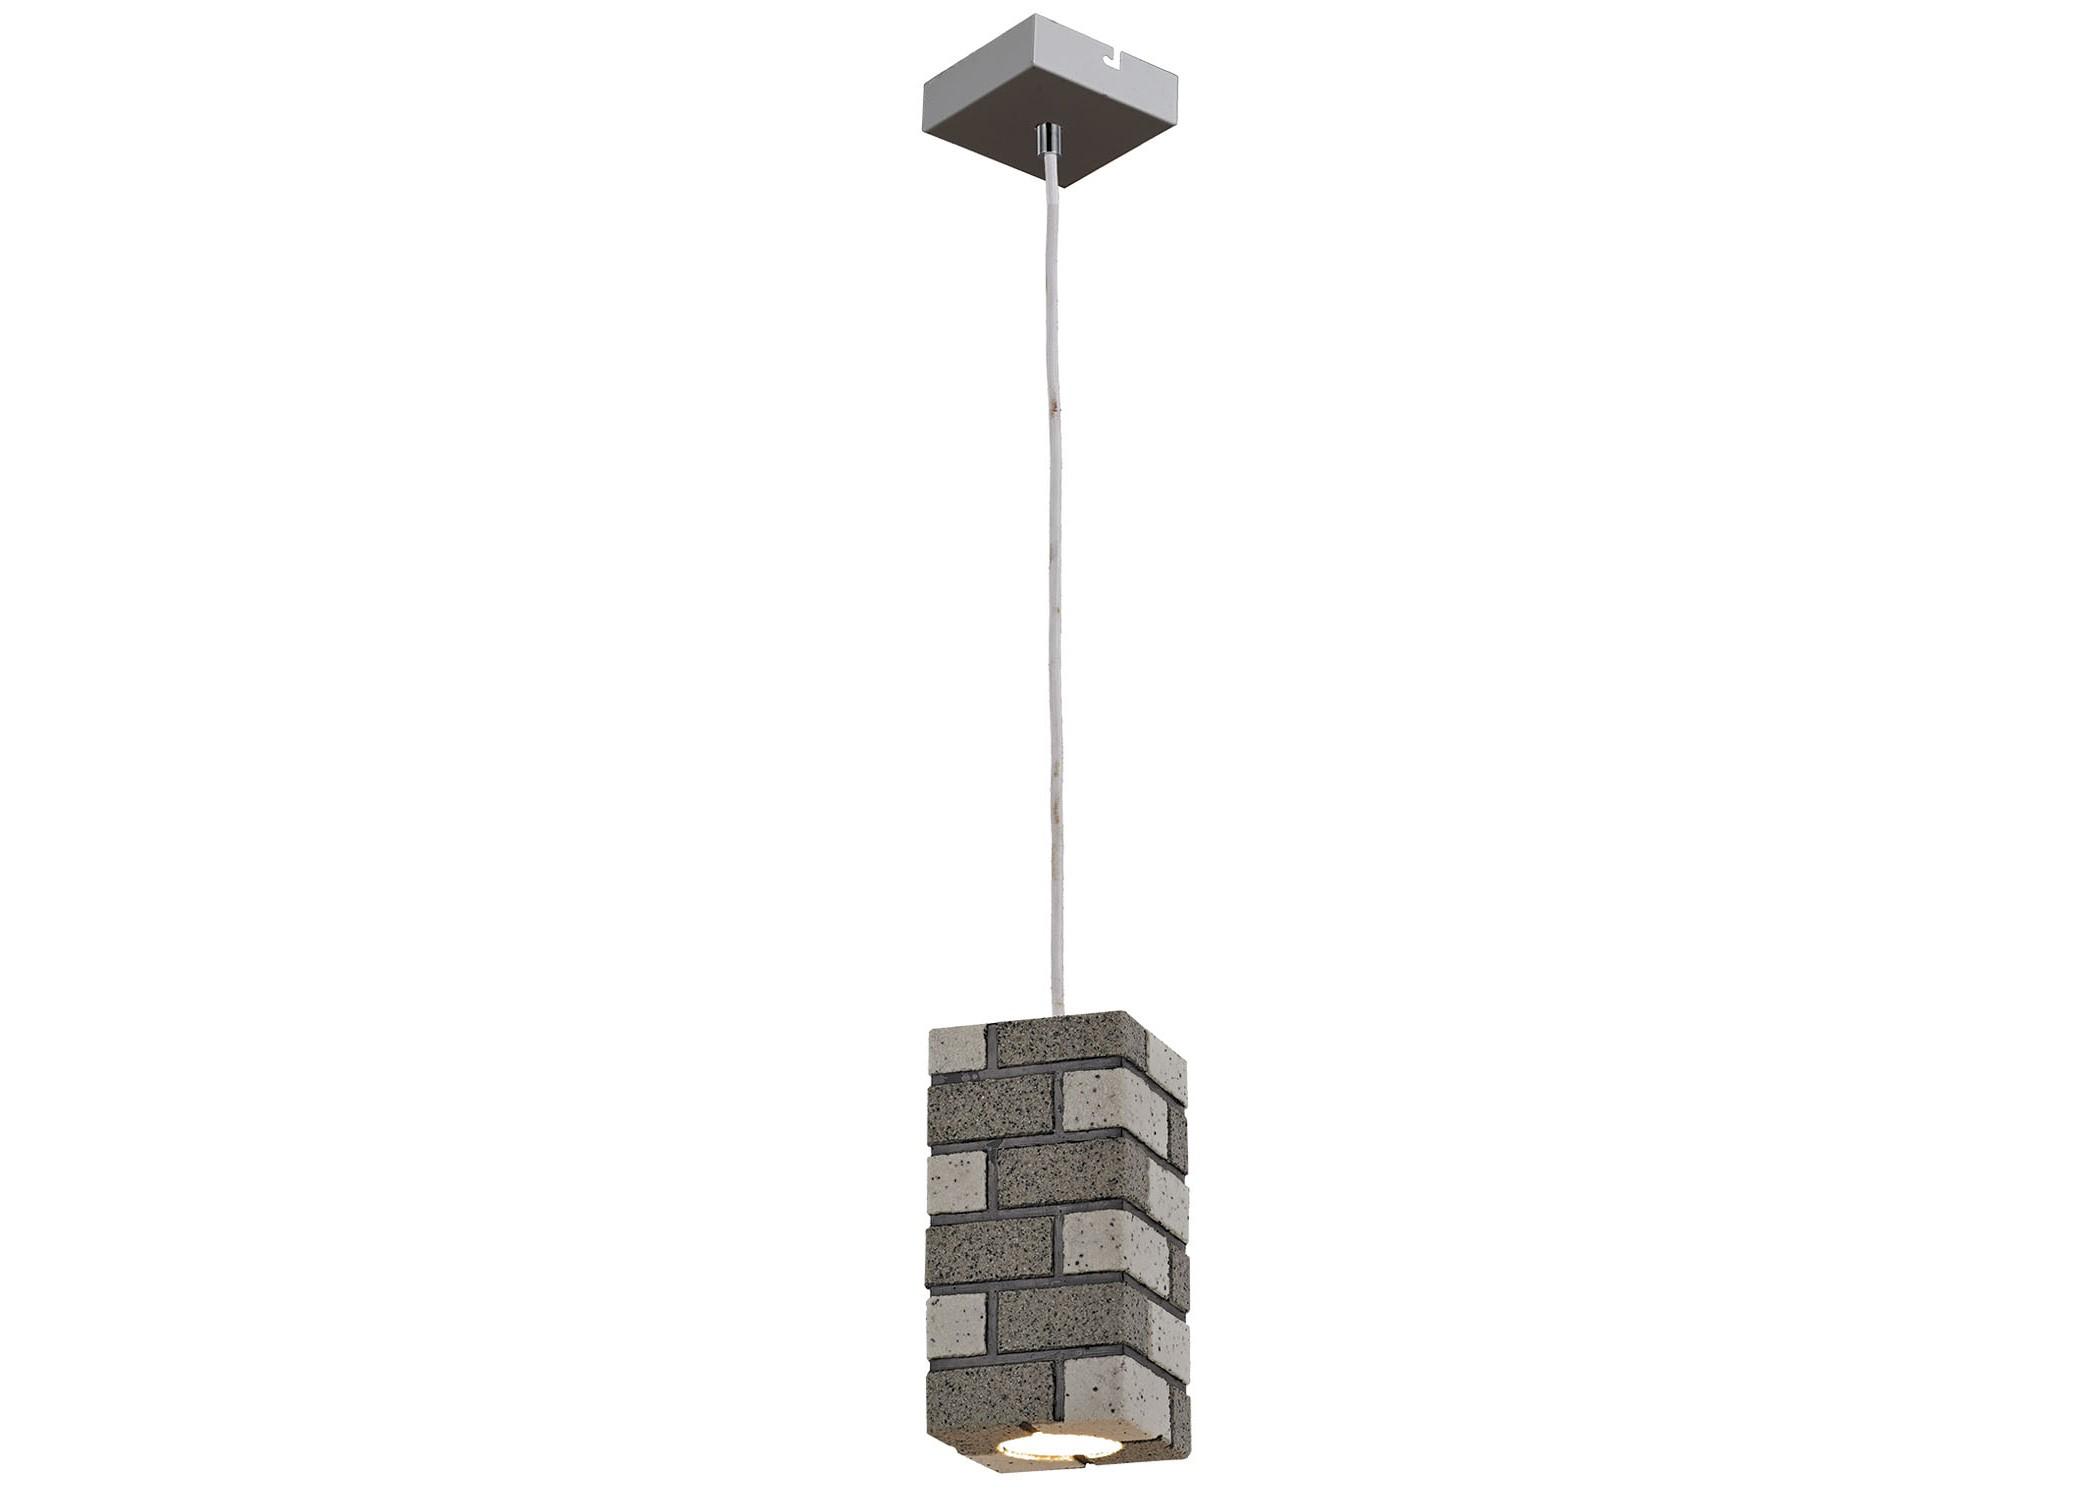 Подвесной светильникПодвесные светильники<br>&amp;lt;div&amp;gt;Цоколь: Gu10&amp;lt;/div&amp;gt;&amp;lt;div&amp;gt;Мощность ламп: 50W&amp;lt;/div&amp;gt;&amp;lt;div&amp;gt;Количество лампочек: 1 (в комплекте)&amp;lt;/div&amp;gt;<br><br>Material: Металл<br>Height см: 150<br>Diameter см: 10